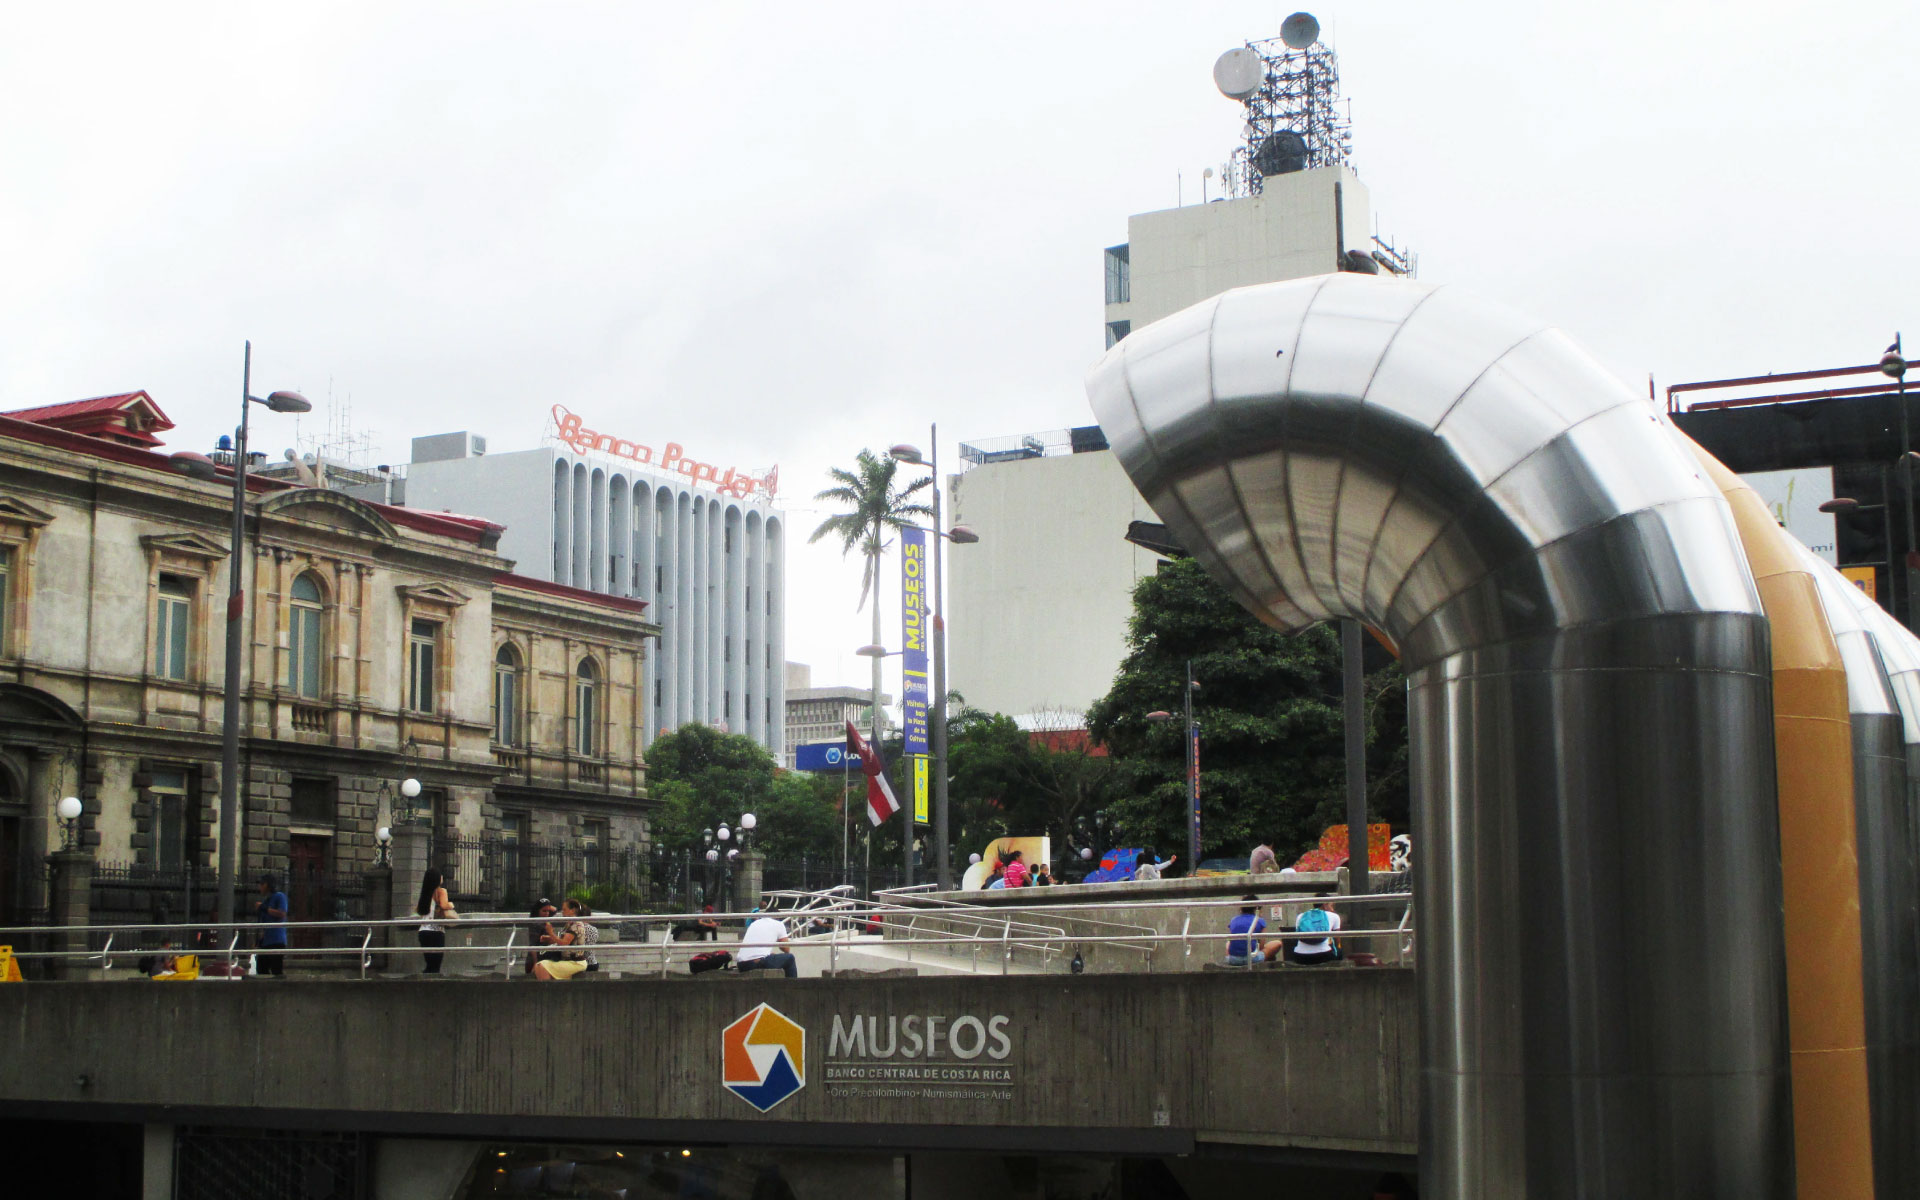 museosbancocentral